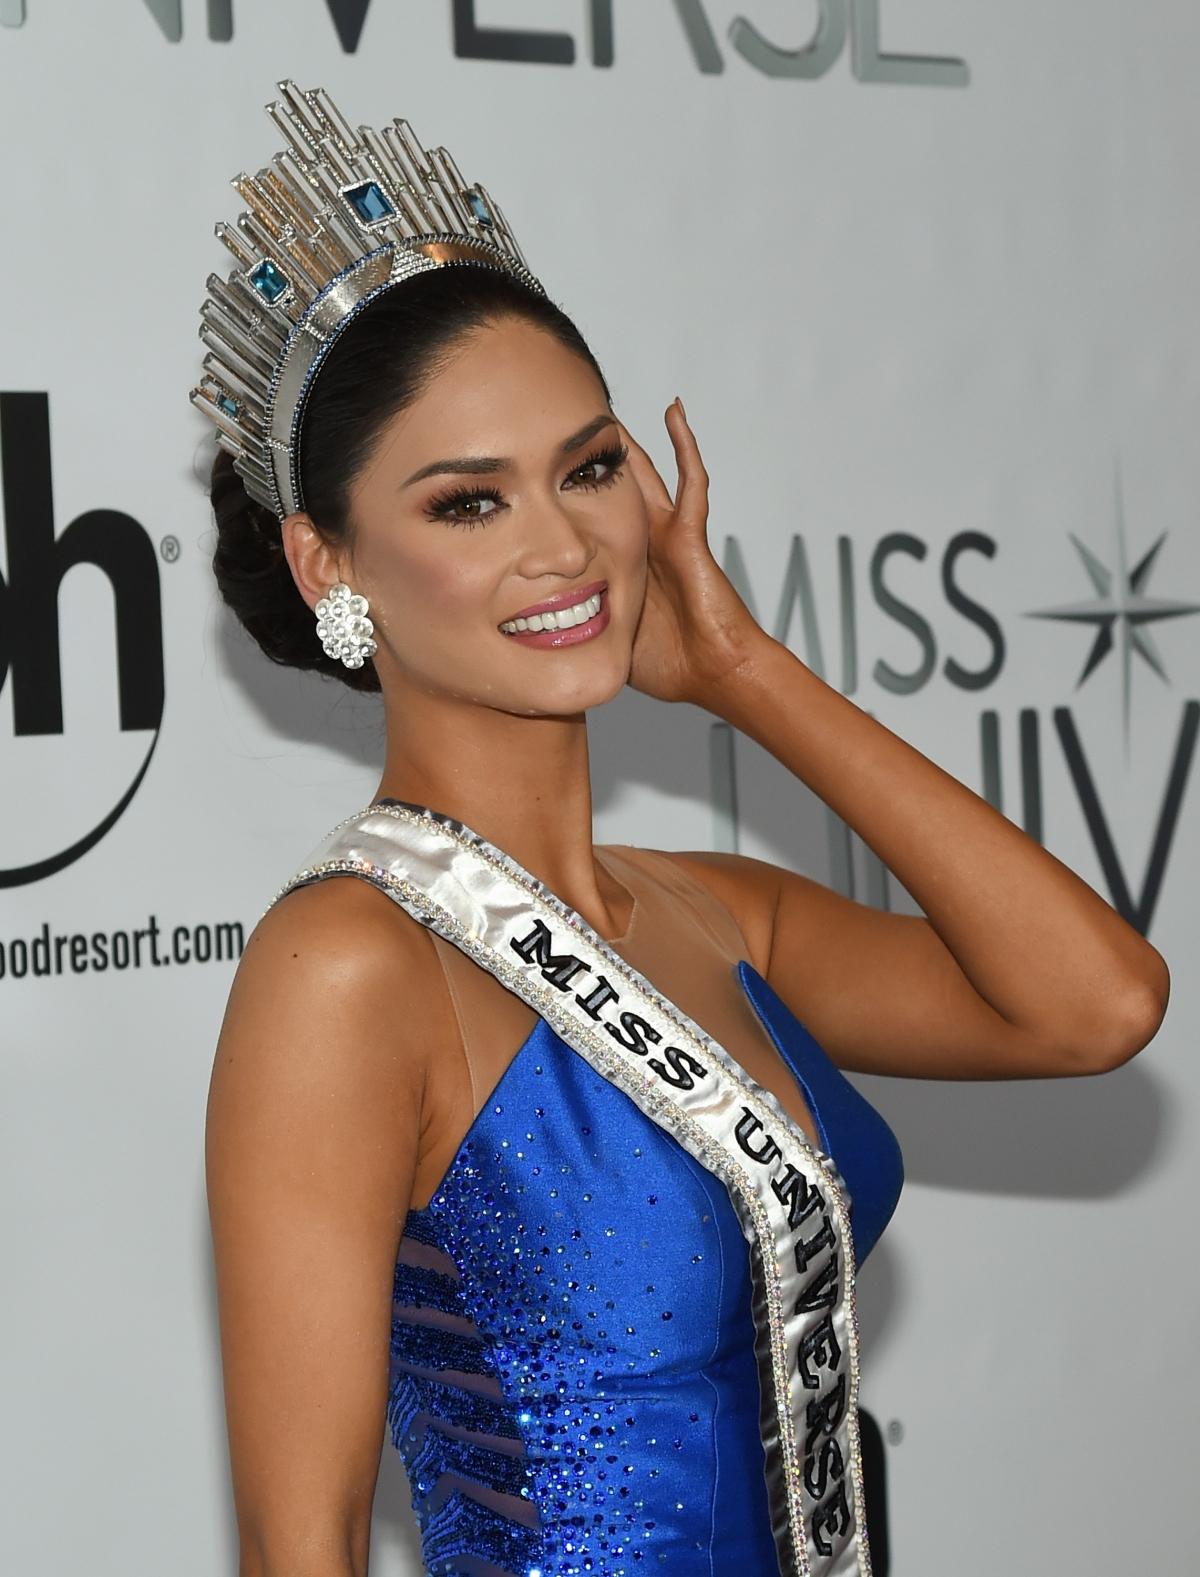 Miss Universe 2015